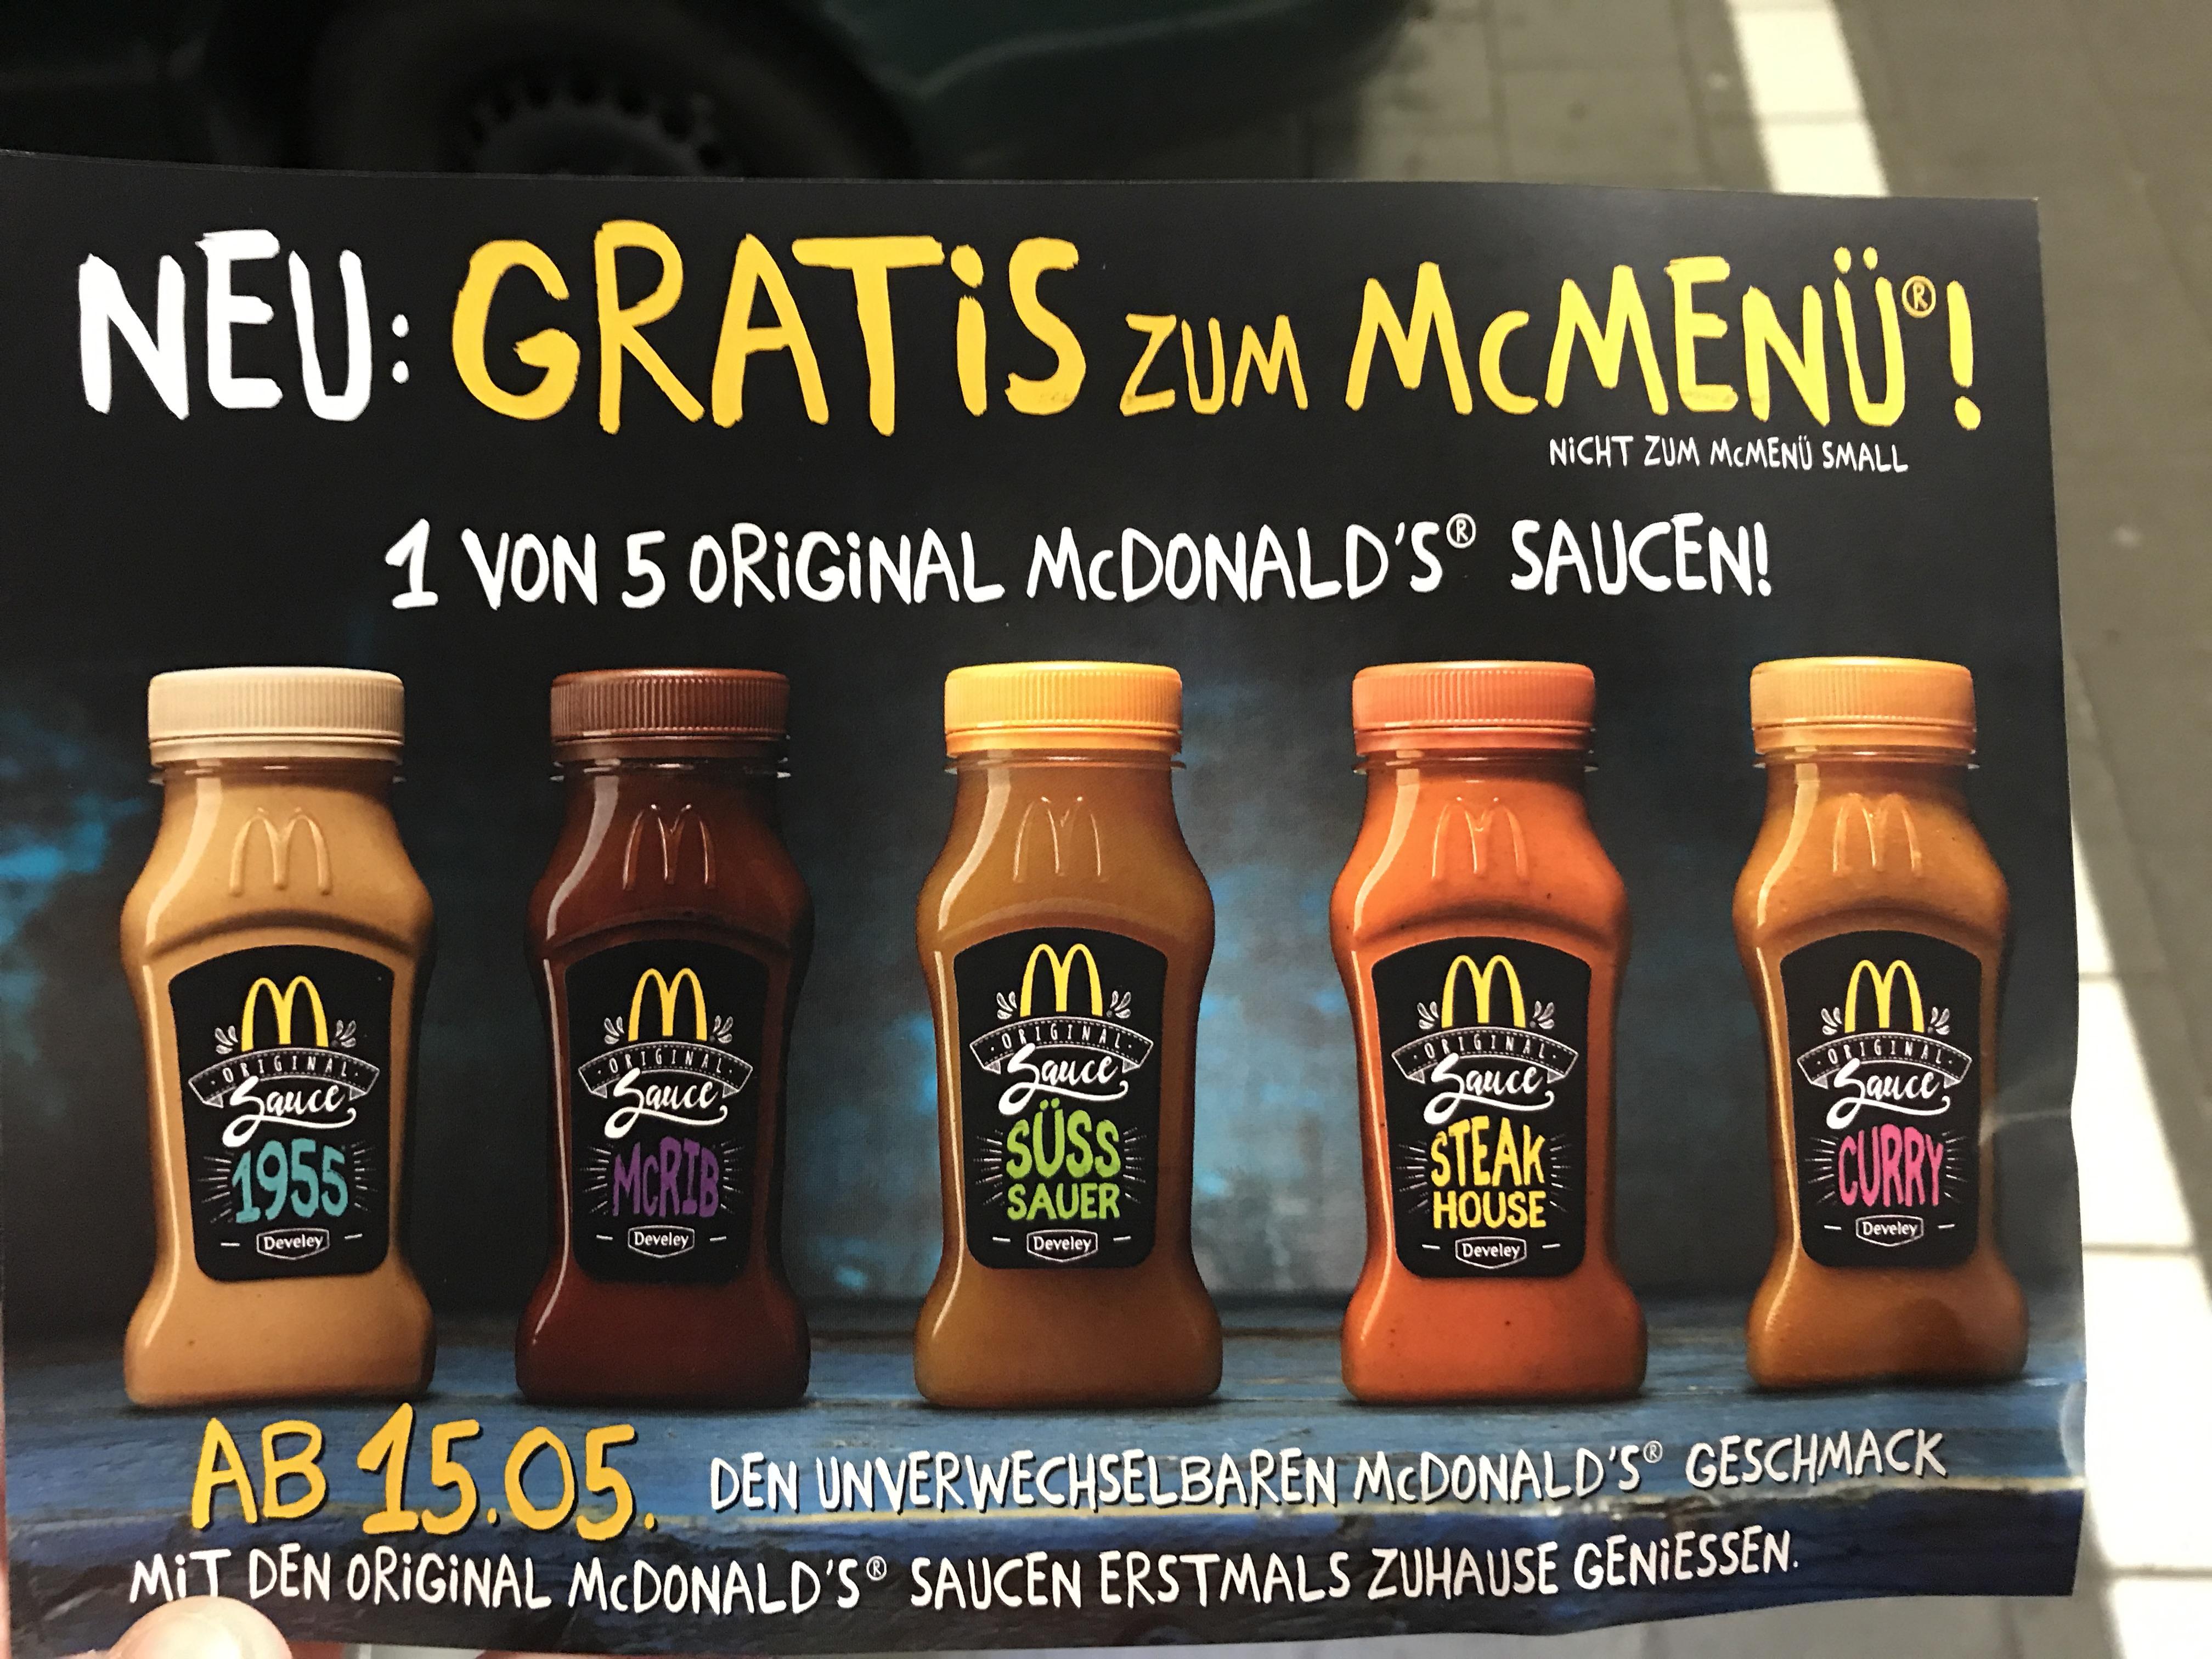 (Ab heute) gratis zum McMenü: original McDonalds Saucen!